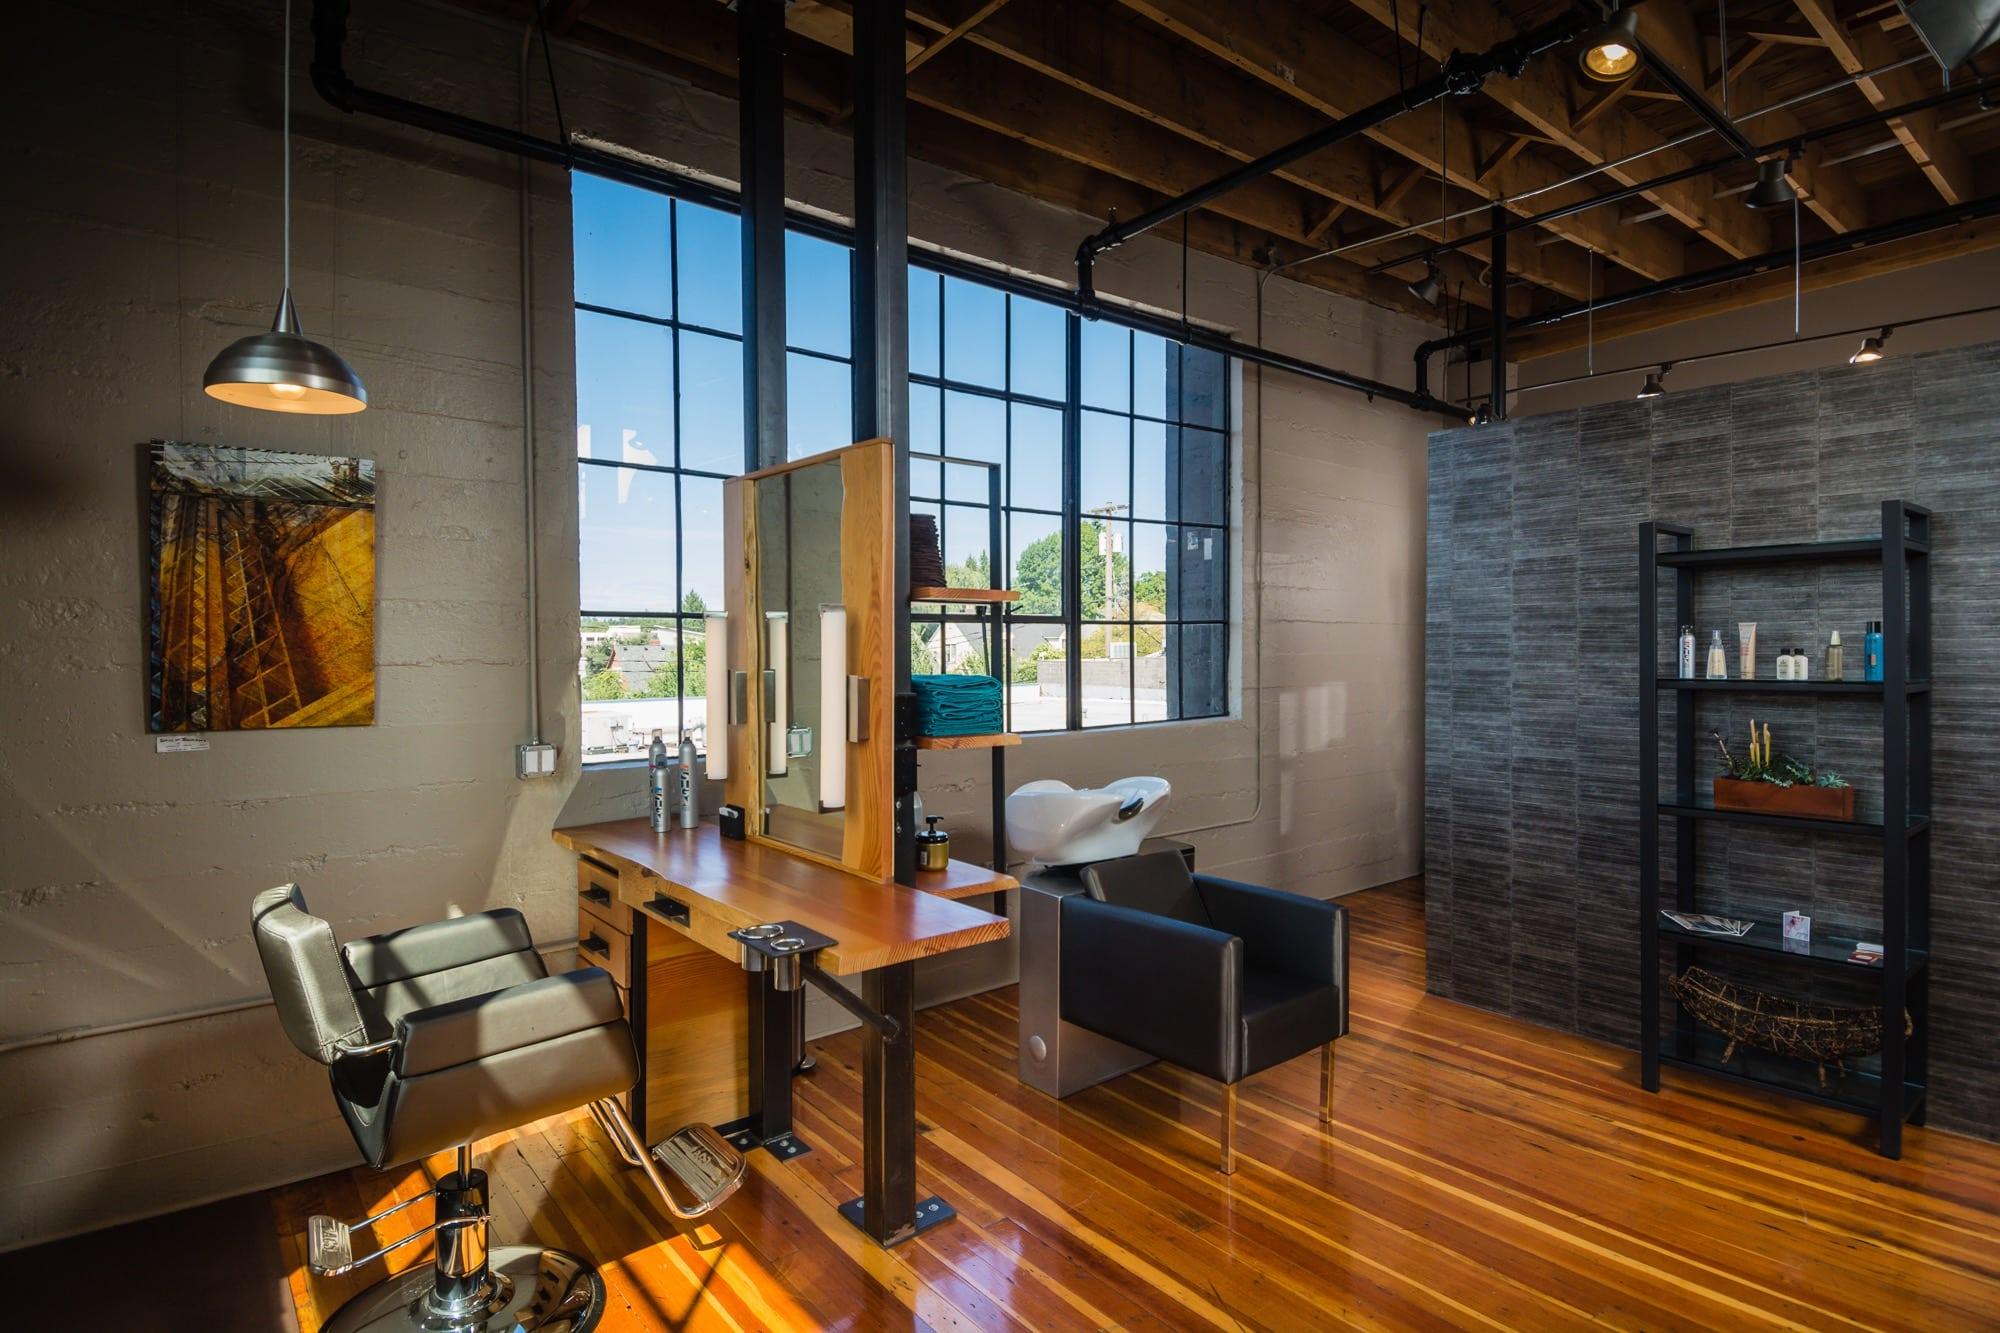 Pangaea interior design portland interior design for Living room coiffeur